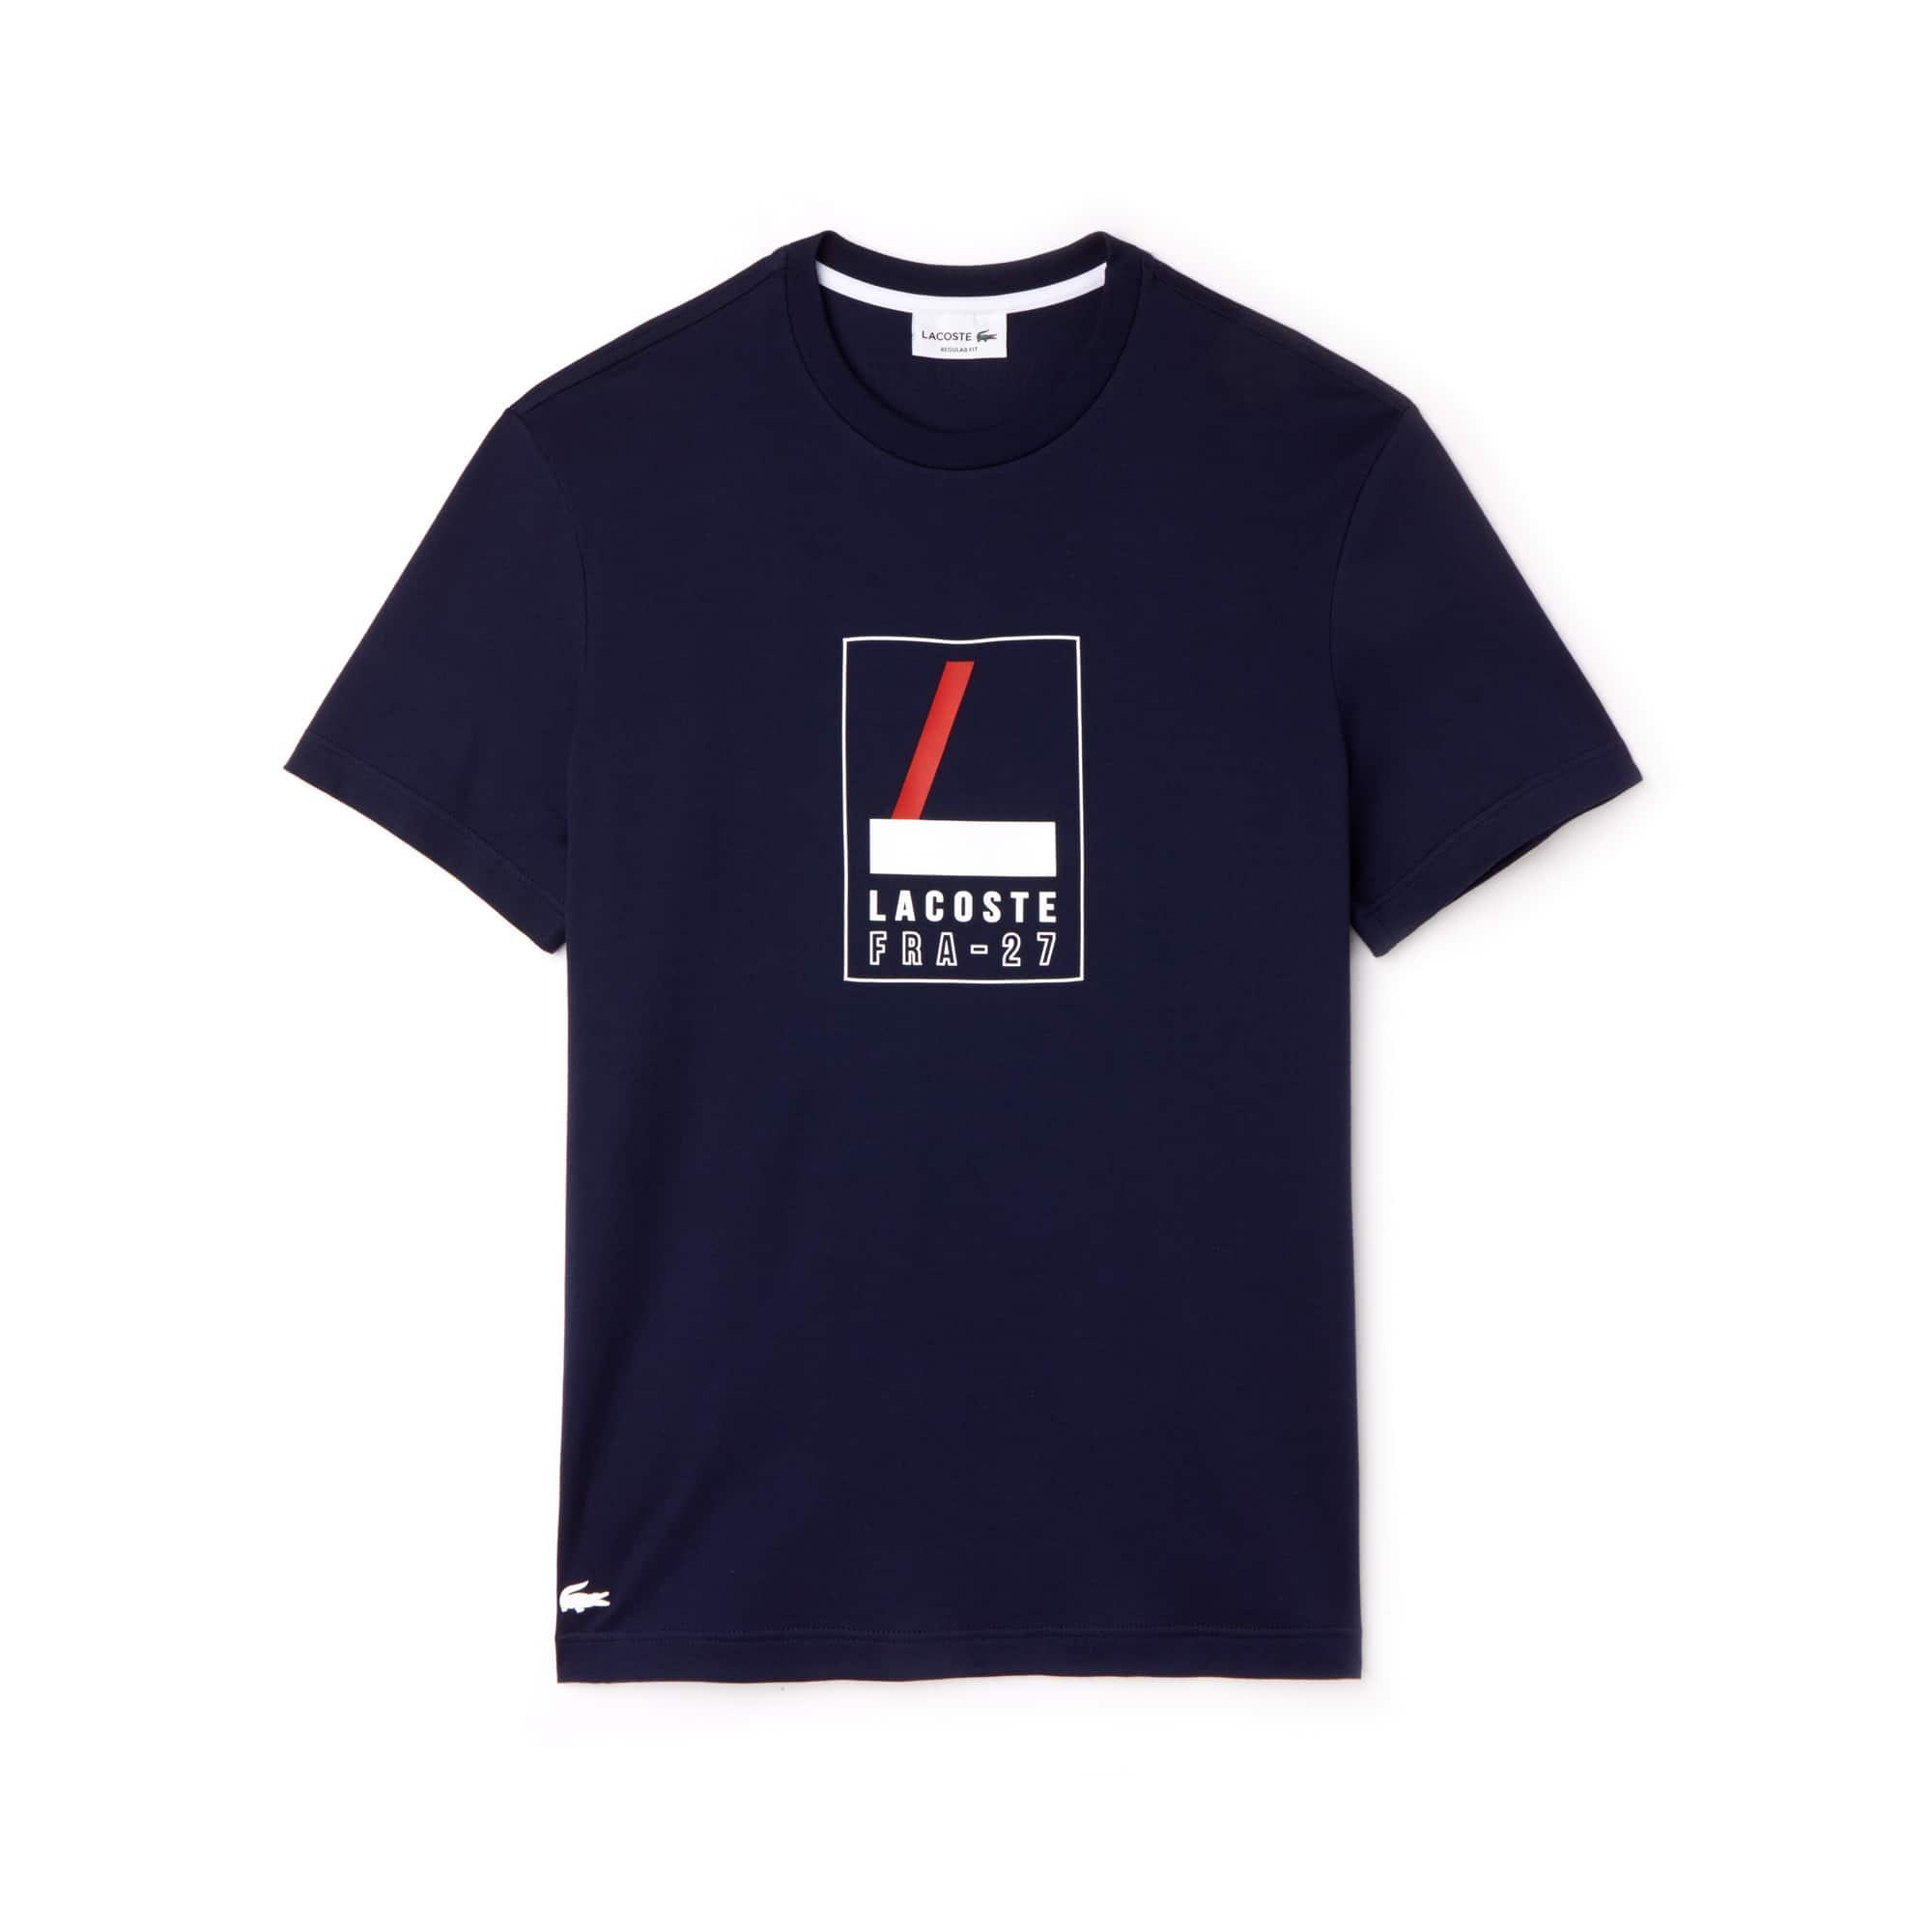 Men's Crew Neck Rubber Lettering Soft Jersey T-shirt